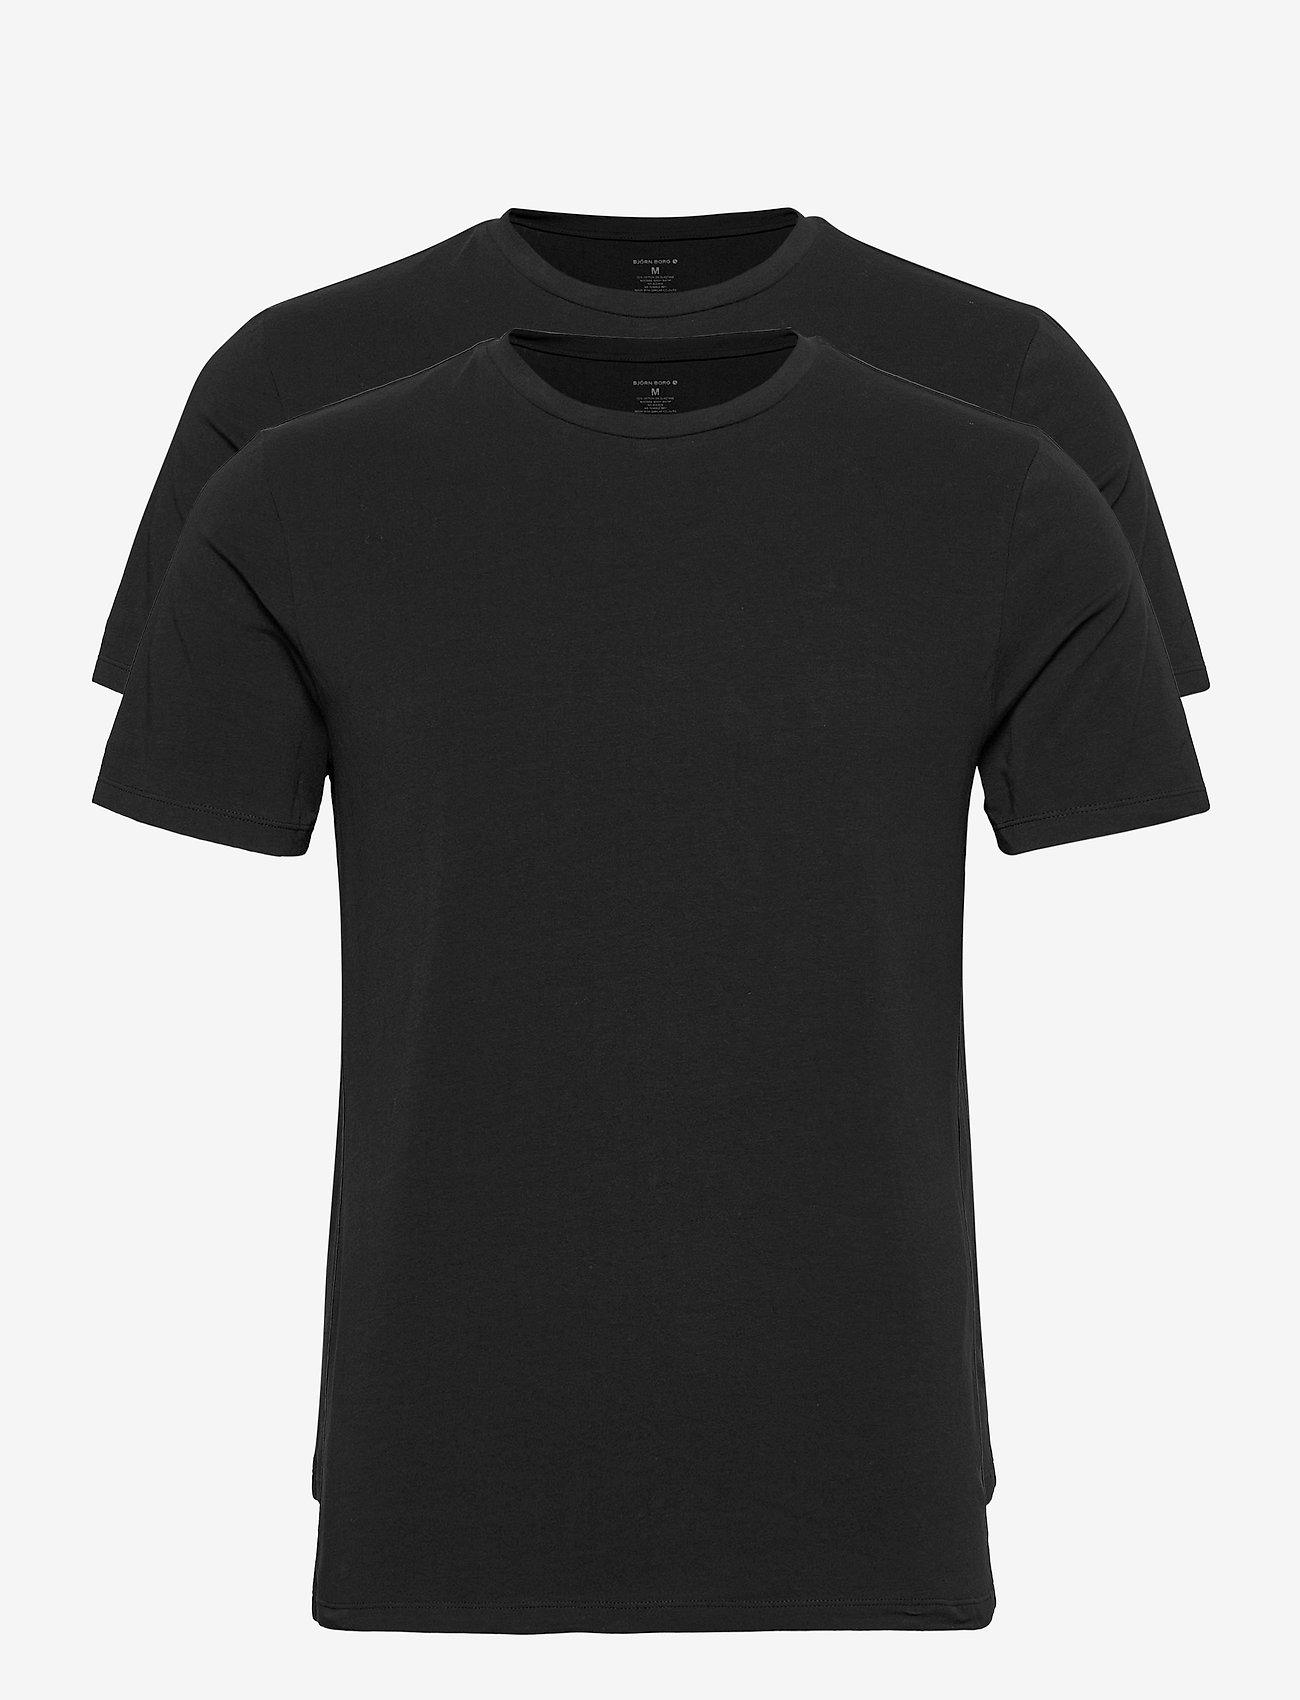 Björn Borg - TEE THOMAS SOLID - basic t-shirts - black beauty - 0